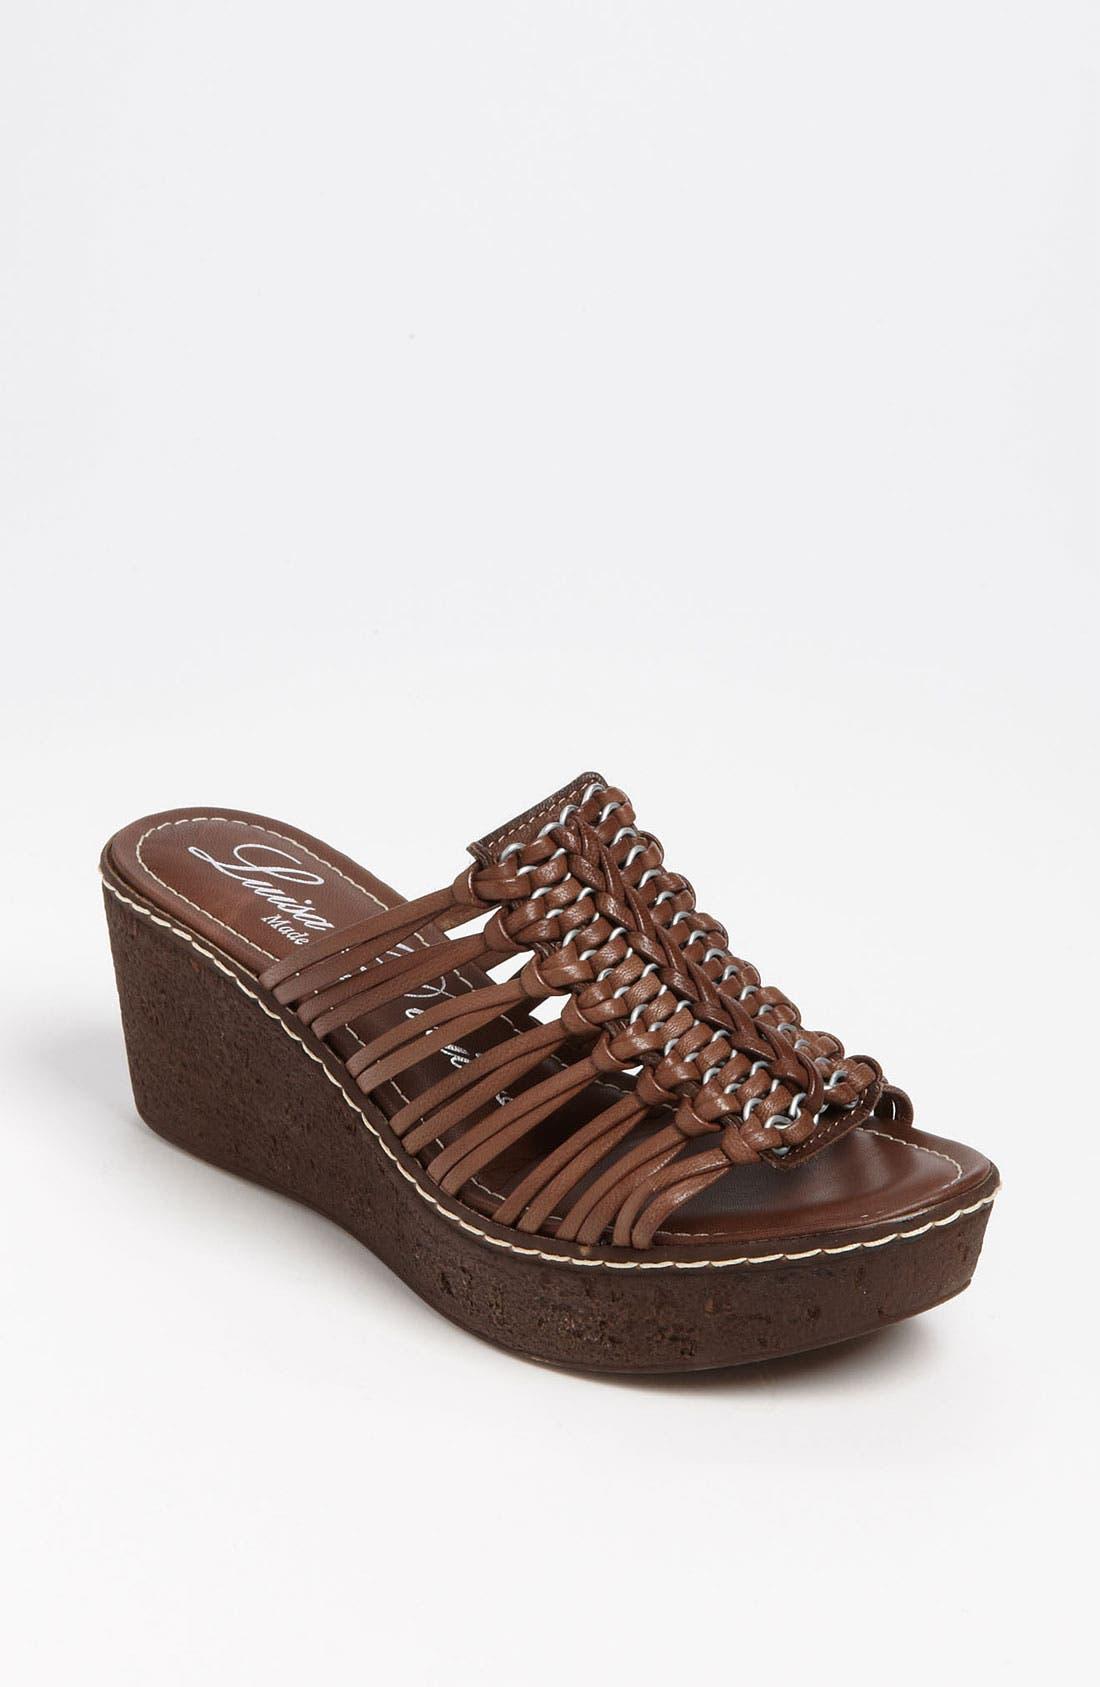 Main Image - Luisa D'orio 'Design' Sandal